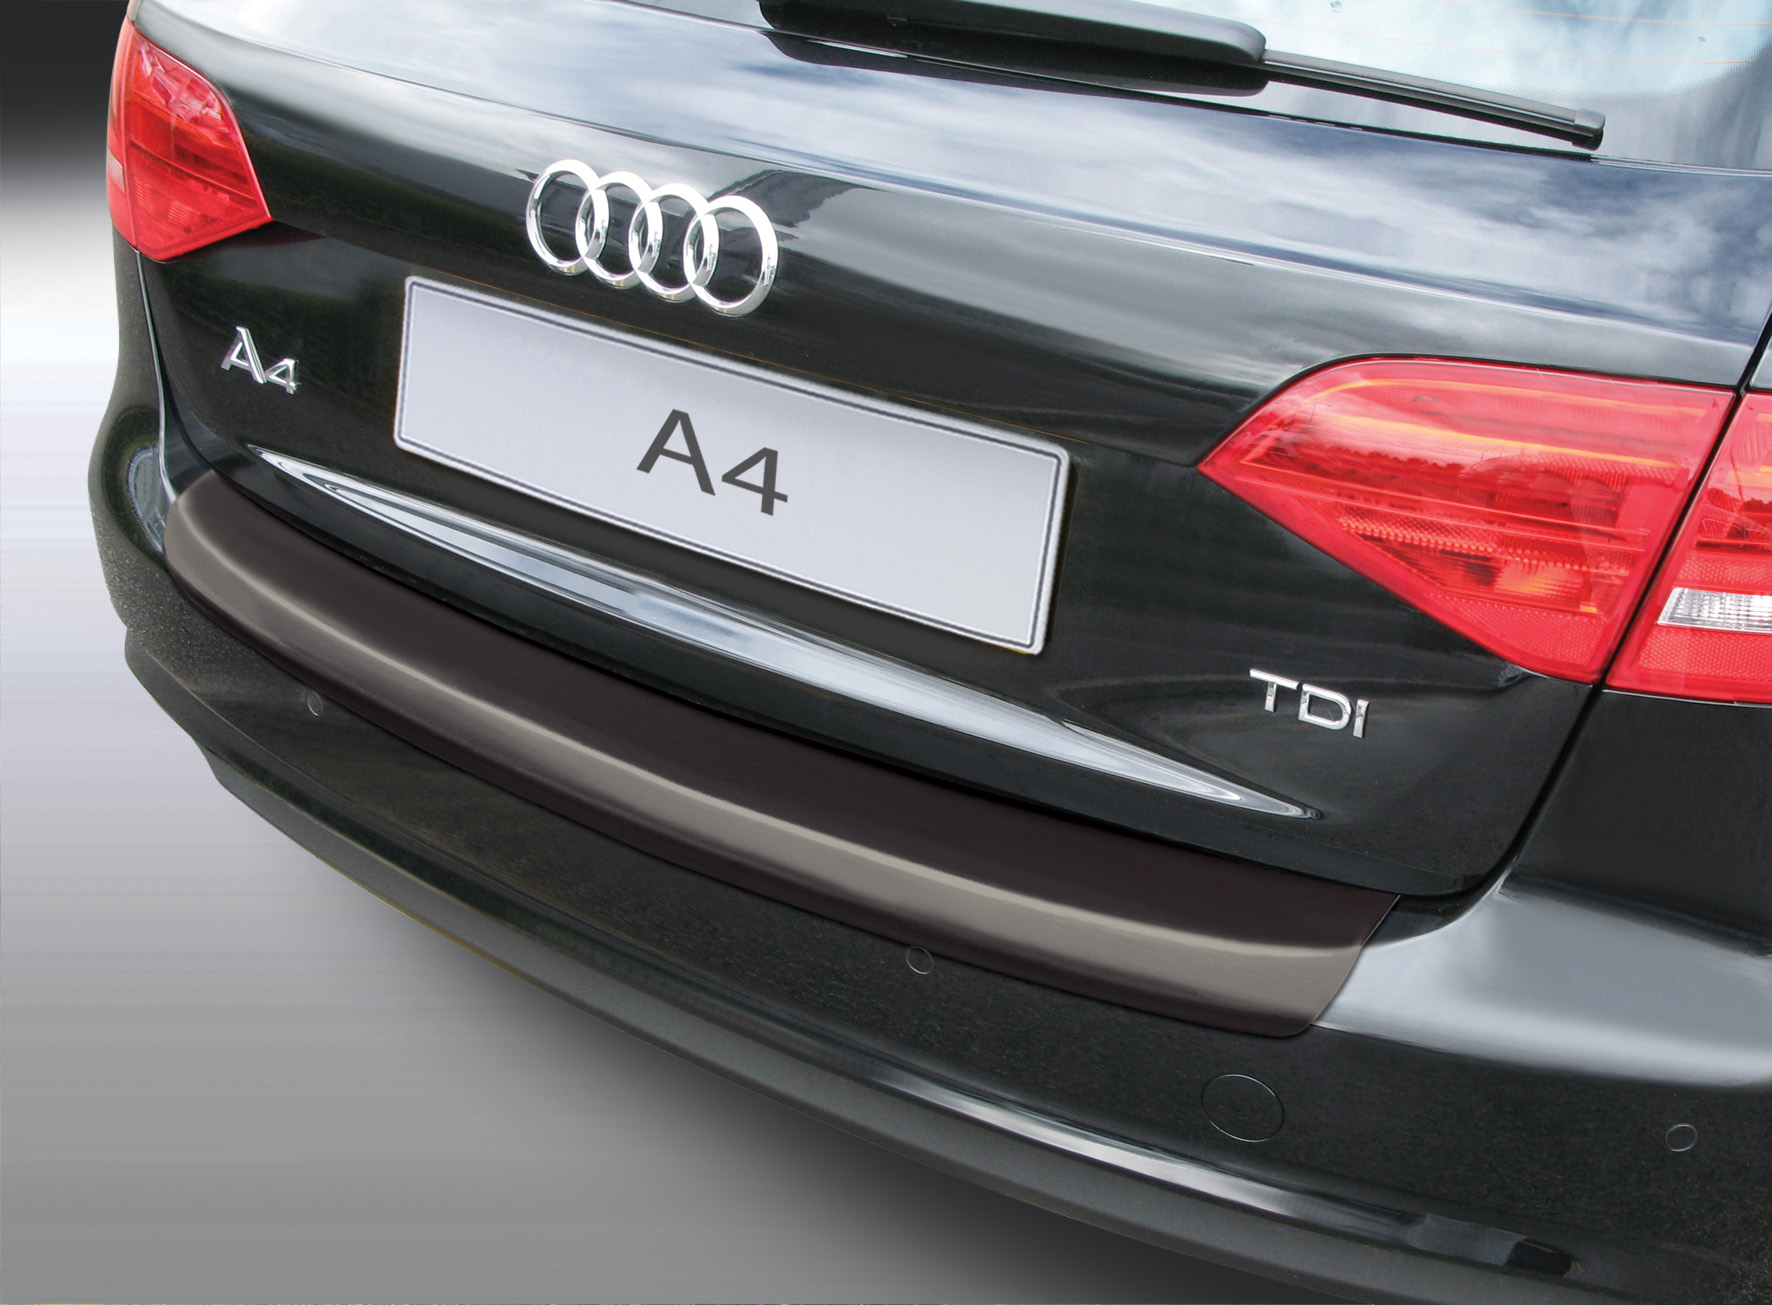 Накладка на задний бампер Audi A4 Avant Quattro, универсал, 2012-2015